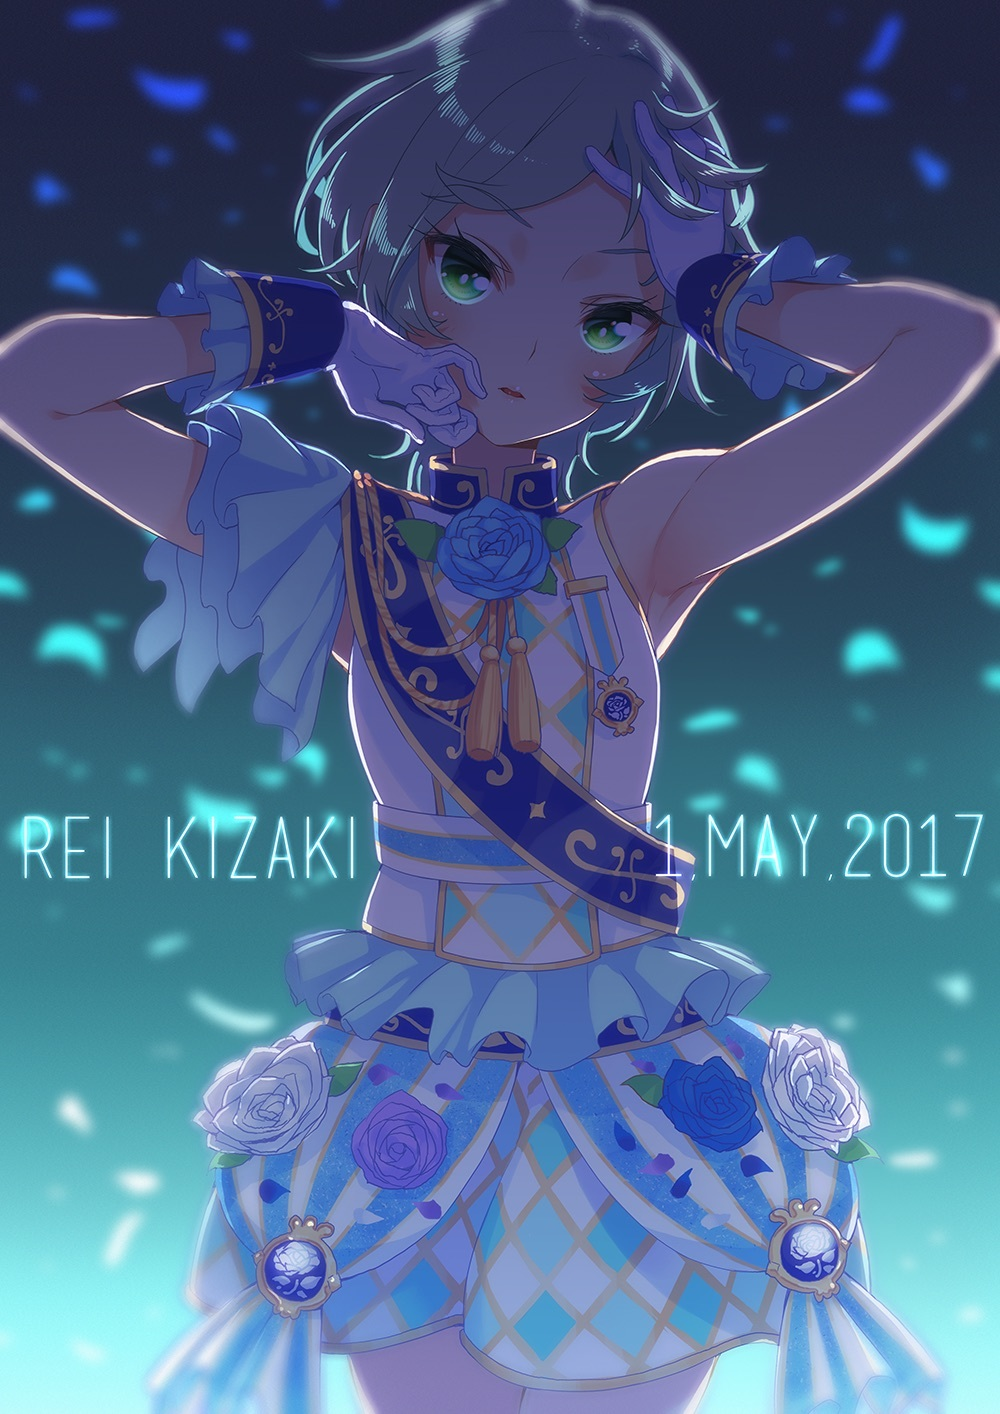 Aikatsu stars kizaki rei - 2017 anime wallpaper ...